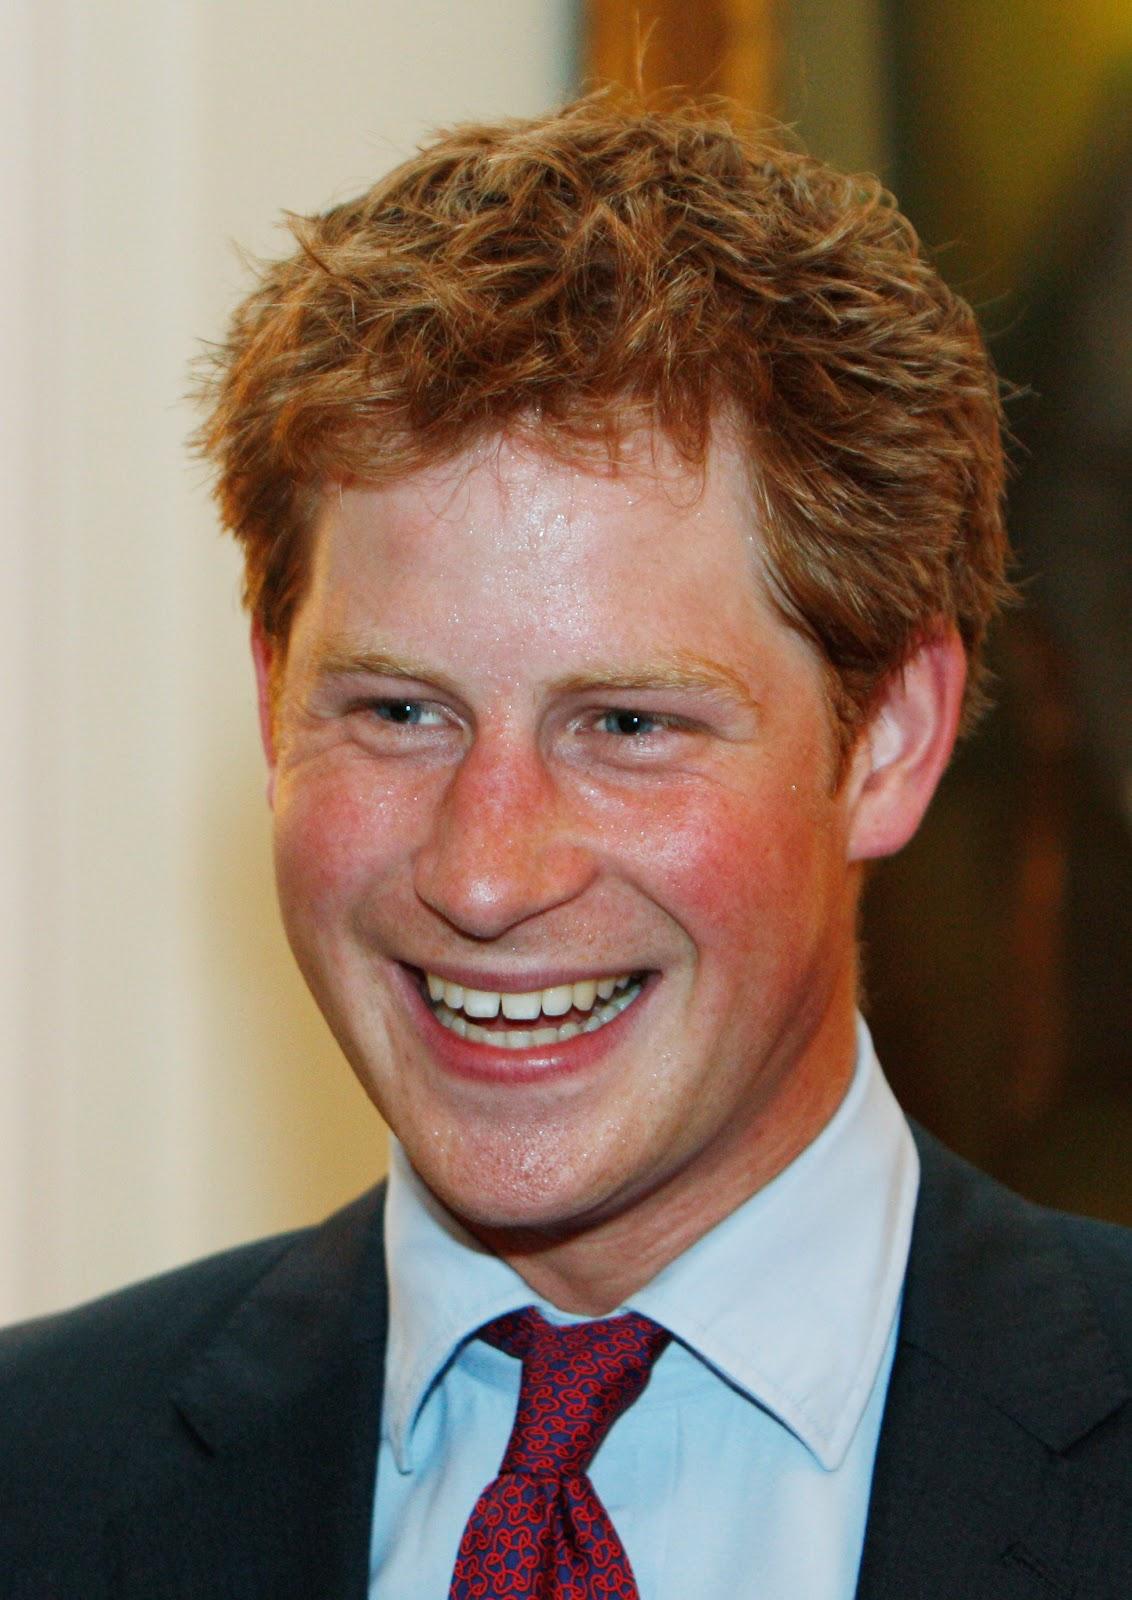 Prince Harry 07jpg